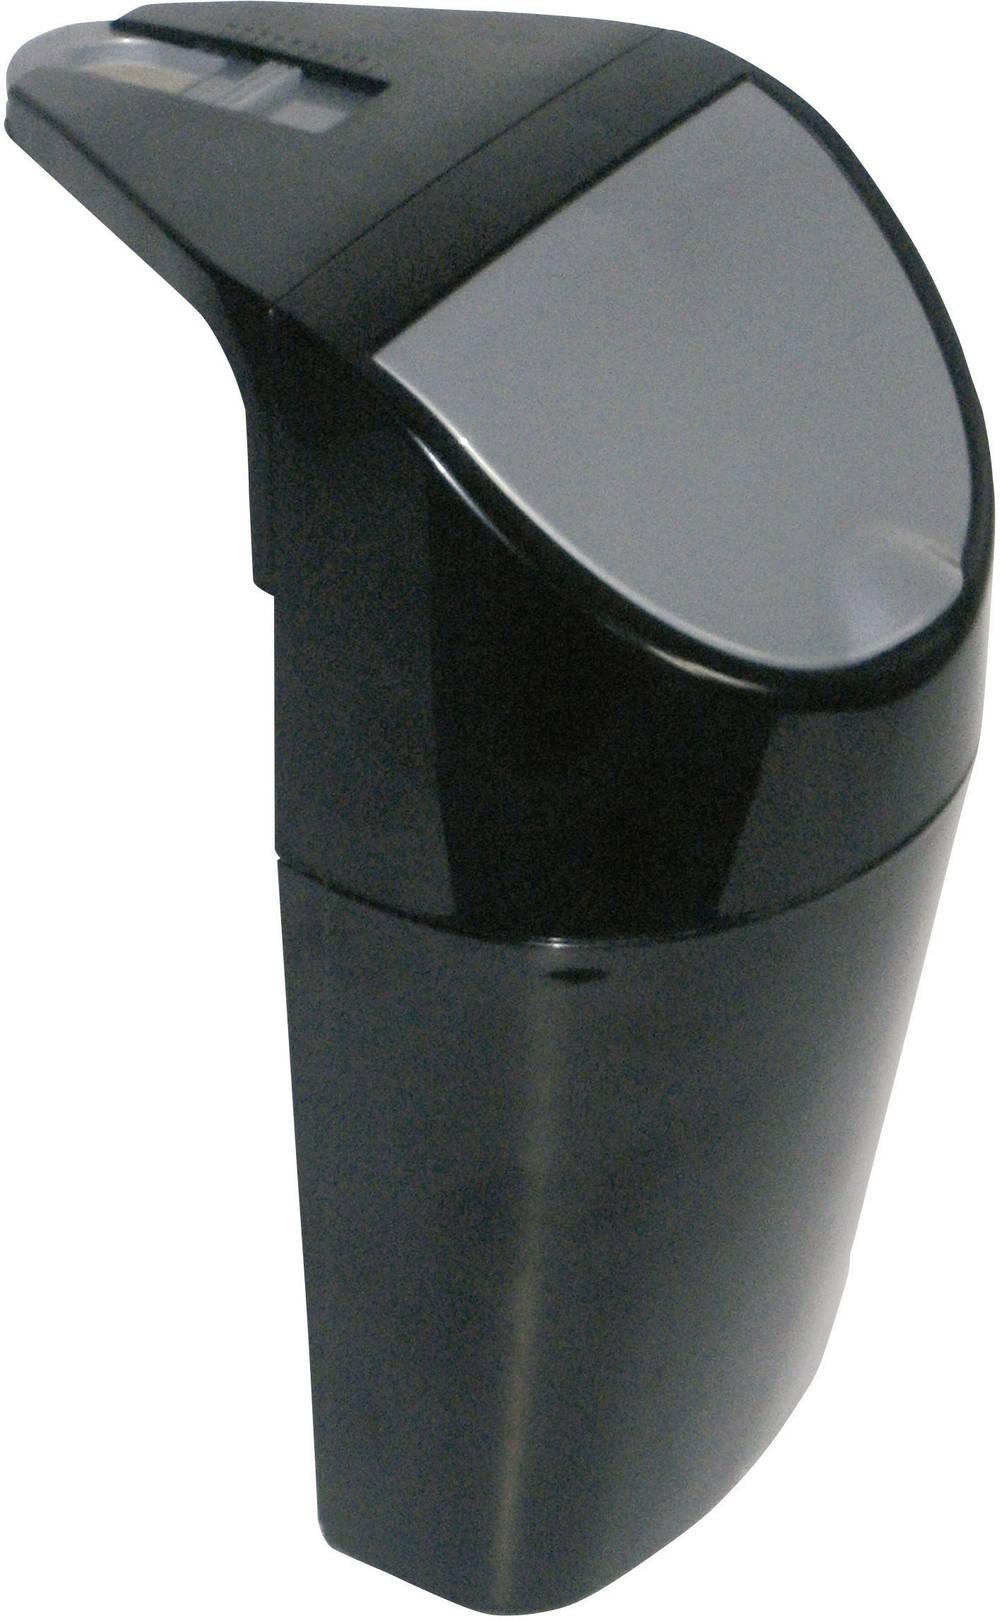 Skraldespand 6520X16 230 mm x 135 mm x 72 mm